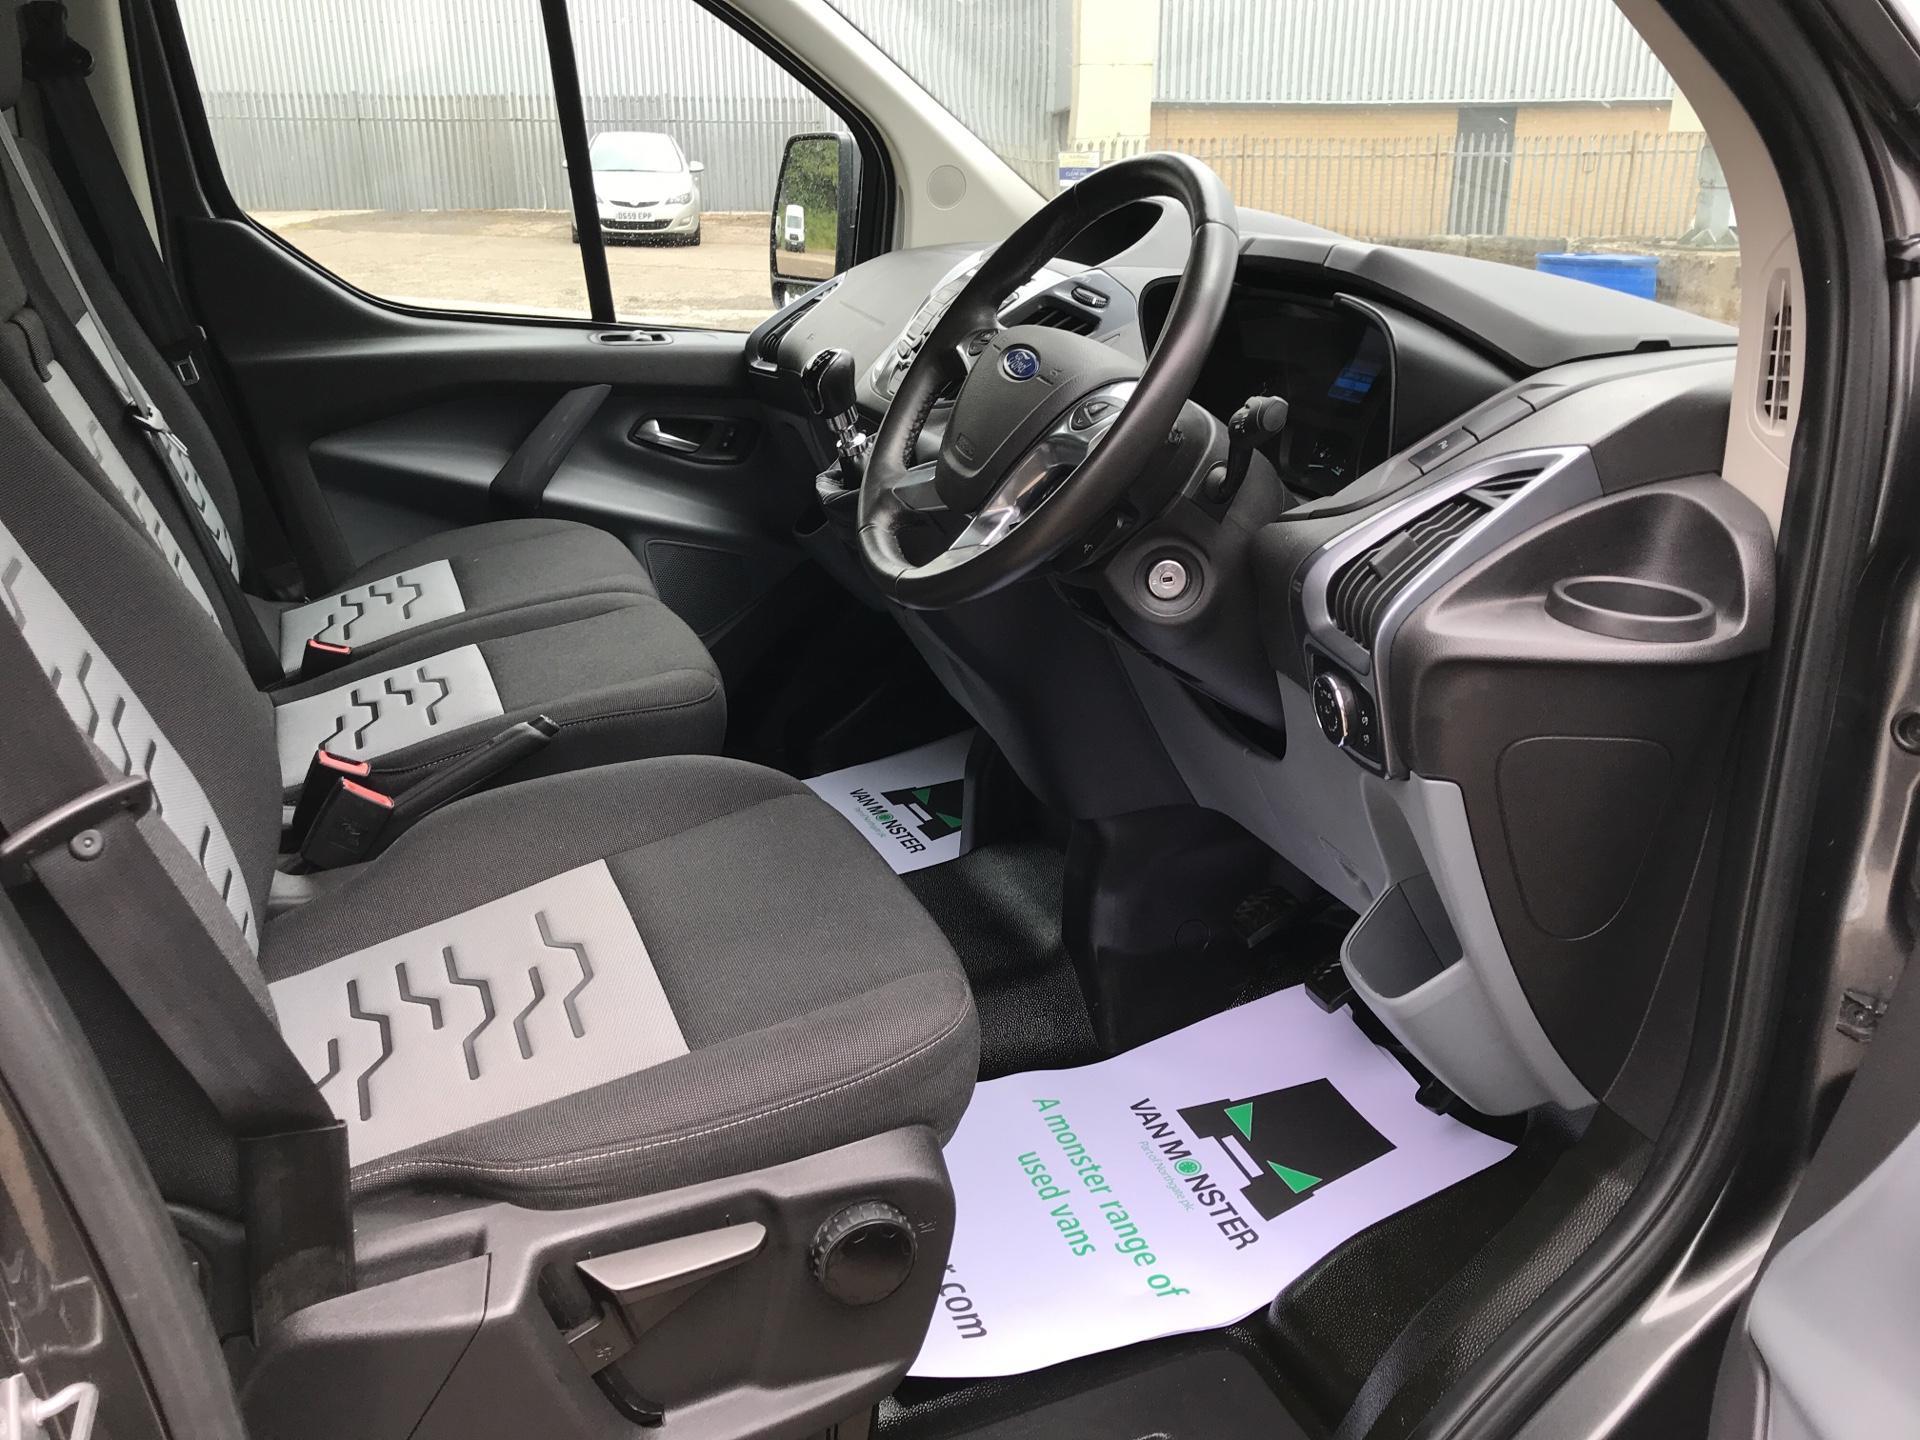 2016 Ford Transit Custom 290 L1 DIESEL FWD 2.2 TDCI 125PS LOW ROOF LIMITED VAN EURO 5 (DV16OKP) Image 9